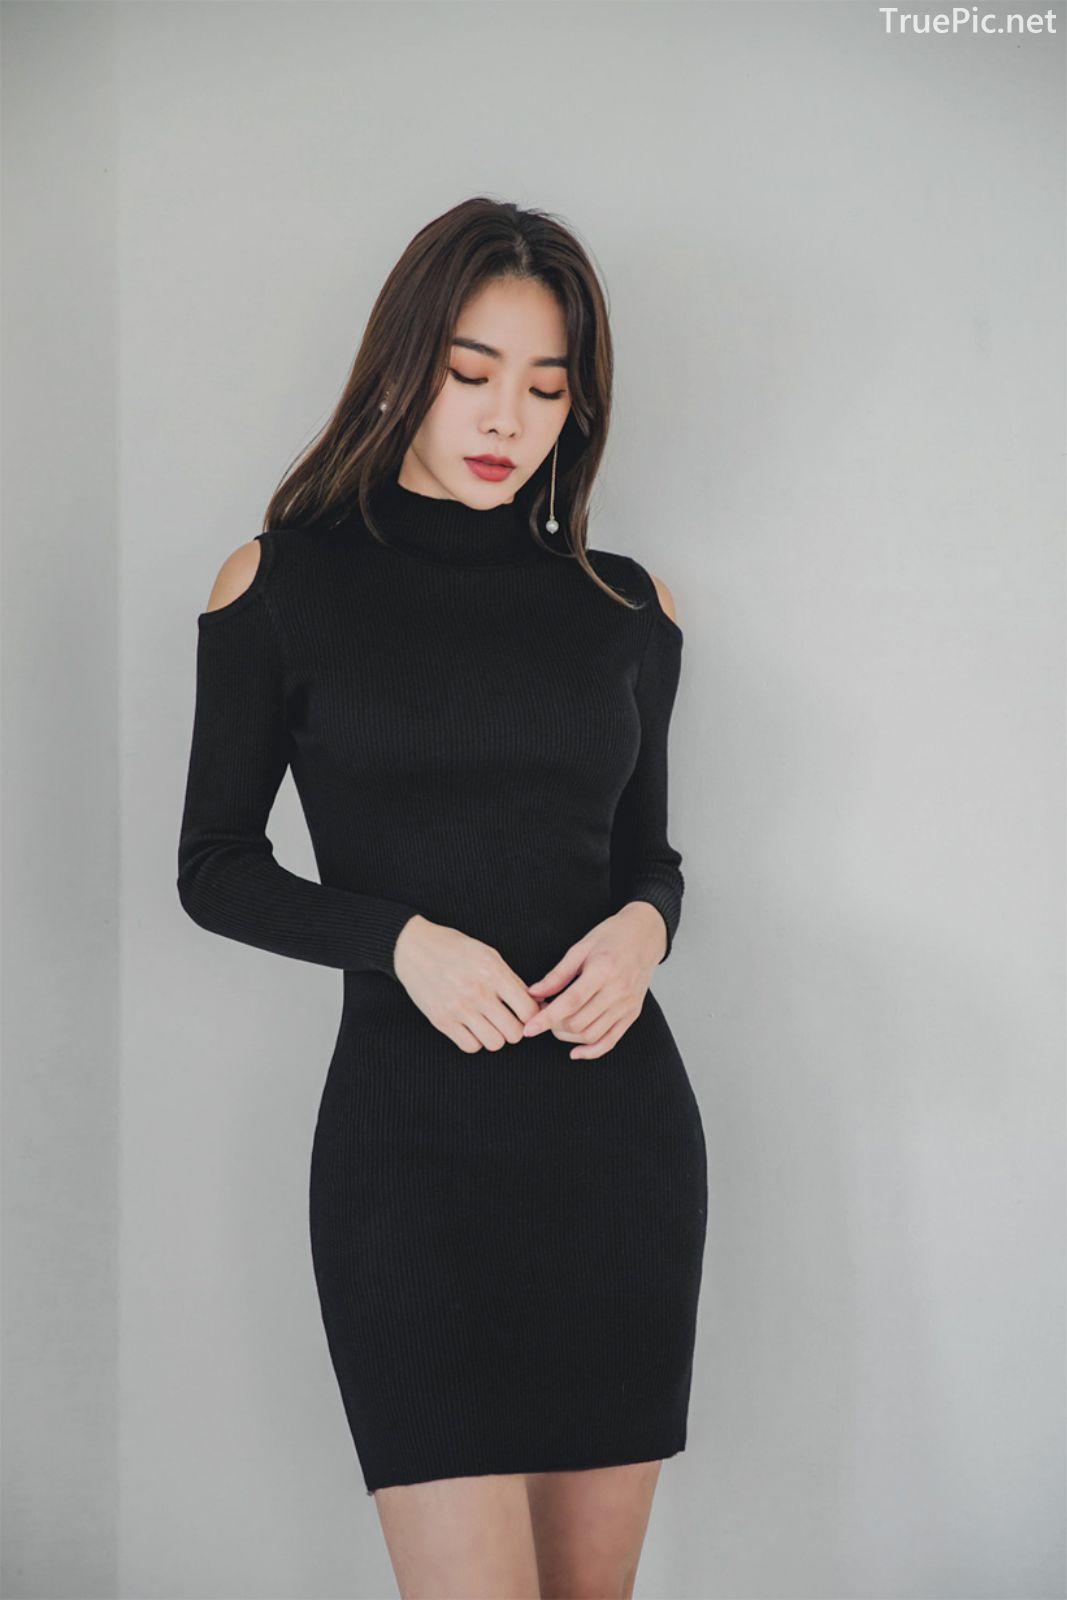 Korean fashion model - An Seo Rin - Woolen office dress collection - TruePic.net - Picture 7